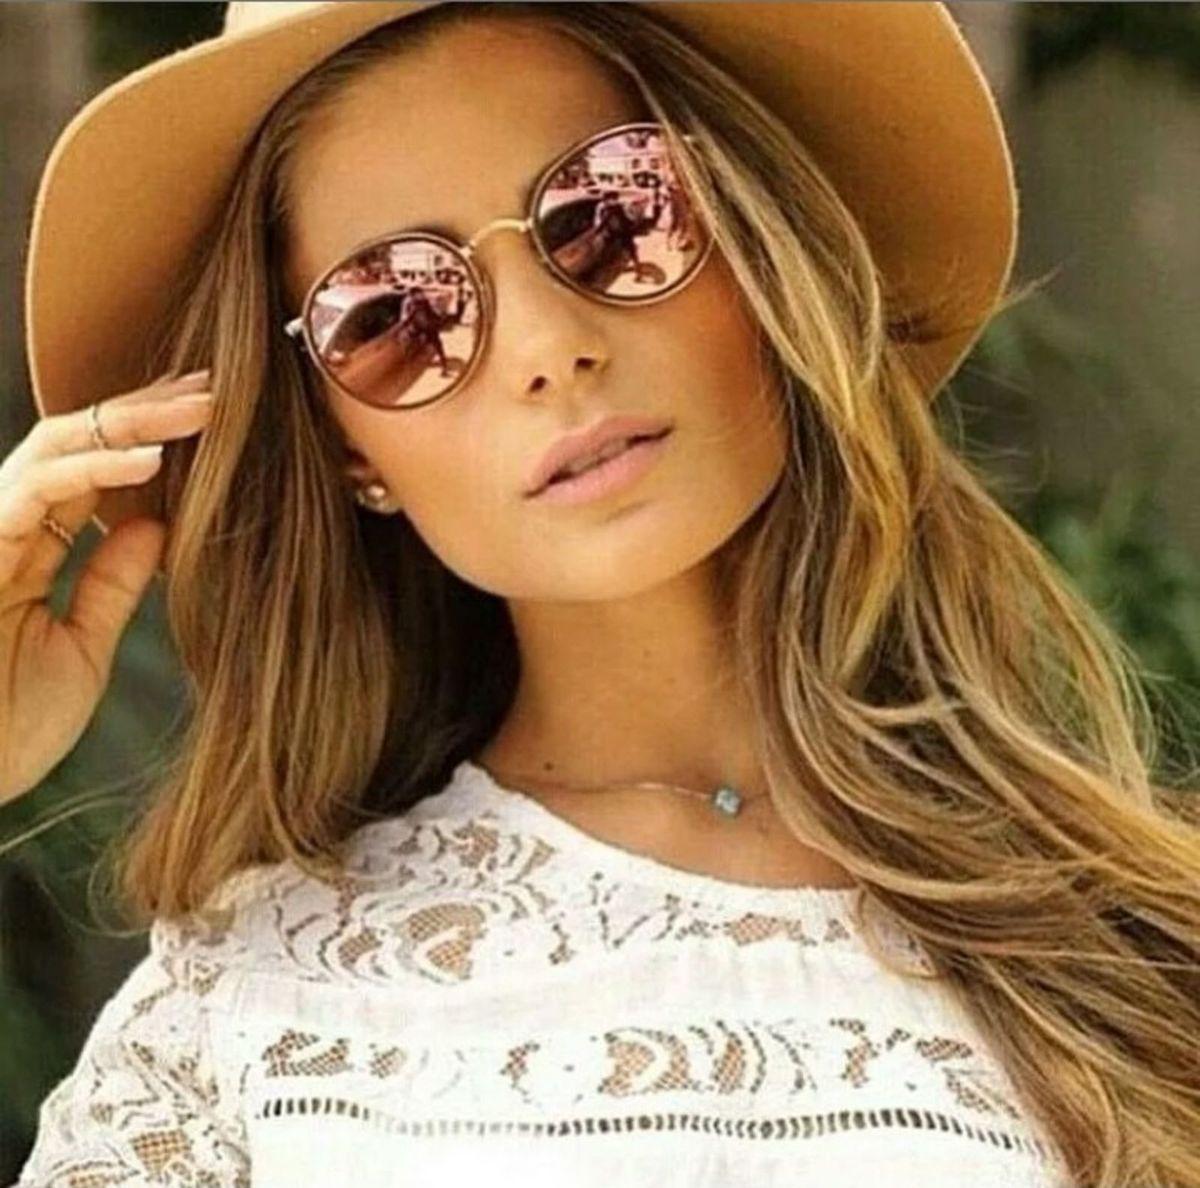 ray ban round dobravel rosa - óculos ray-ban.  Czm6ly9wag90b3muzw5qb2vplmnvbs5ici9wcm9kdwn0cy84nzyxnjavntuxyjuxngywyzyzoty2ntriytg5mtliowq2zde2odcuanbn  ... 2888c68f96